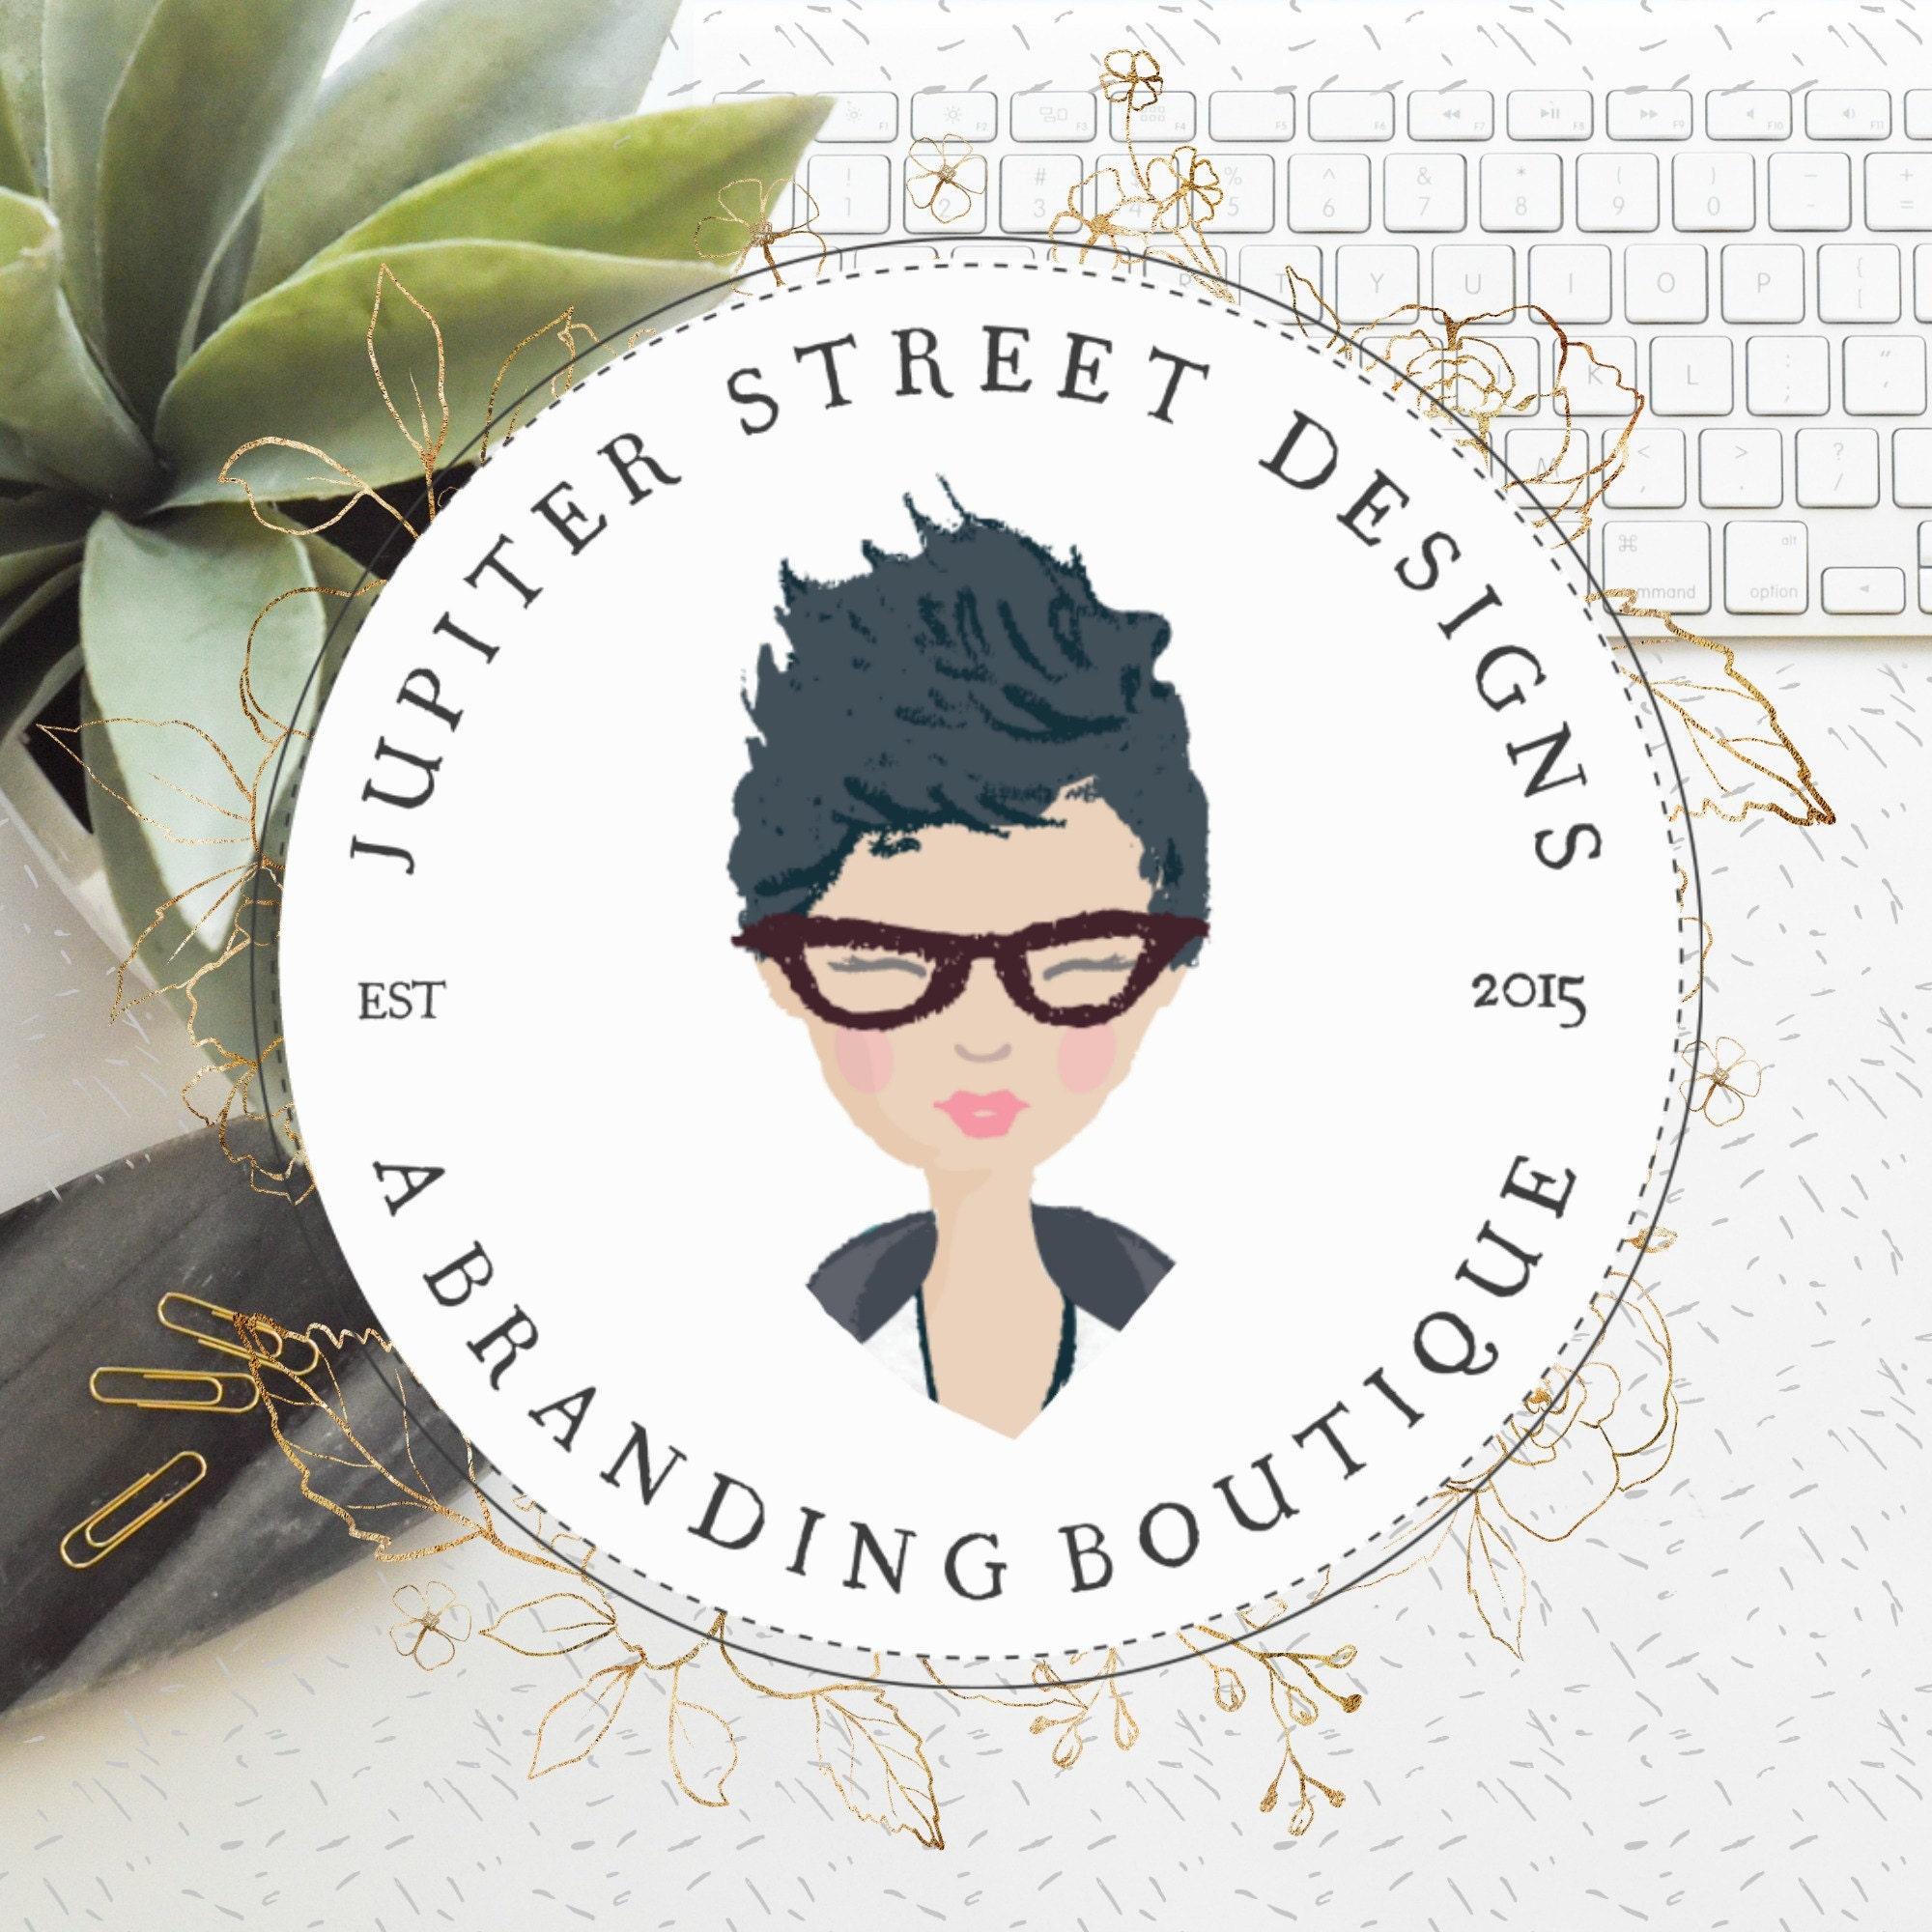 Professional Branding made with care por JupiterStreetDesigns